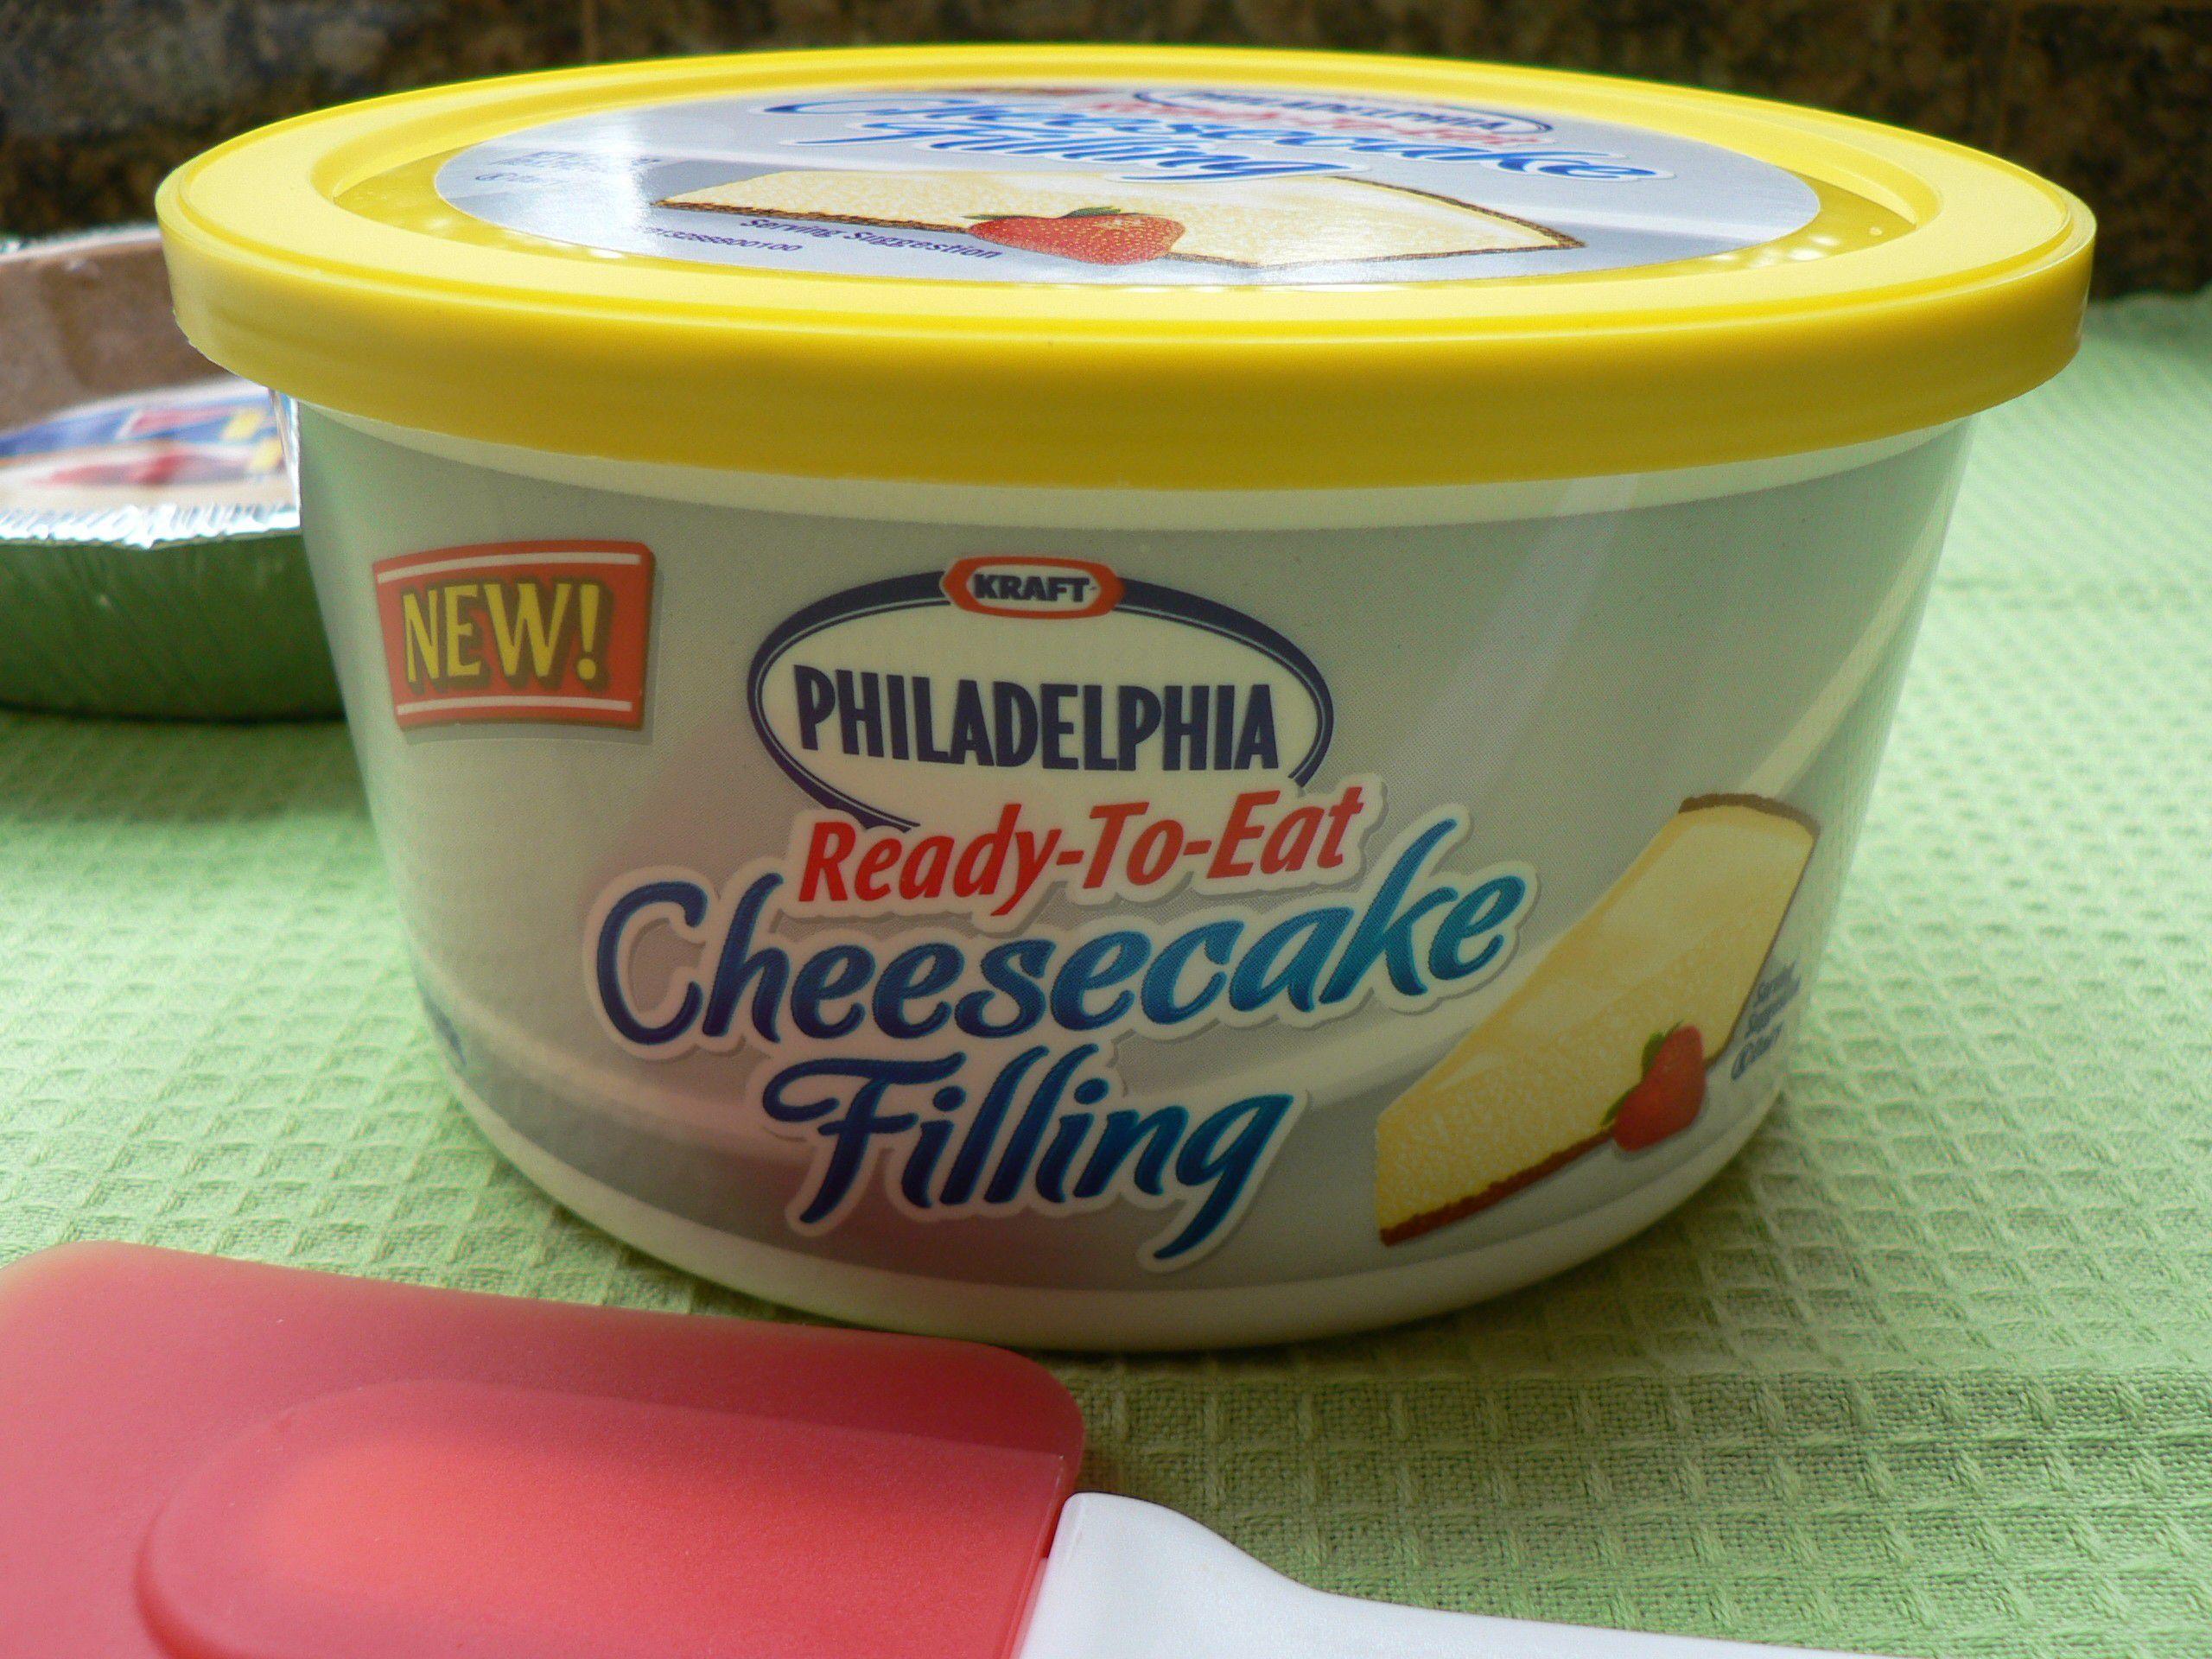 Sensational Review Of Philadelphia Ready To Eat Cheesecake Filling Download Free Architecture Designs Scobabritishbridgeorg